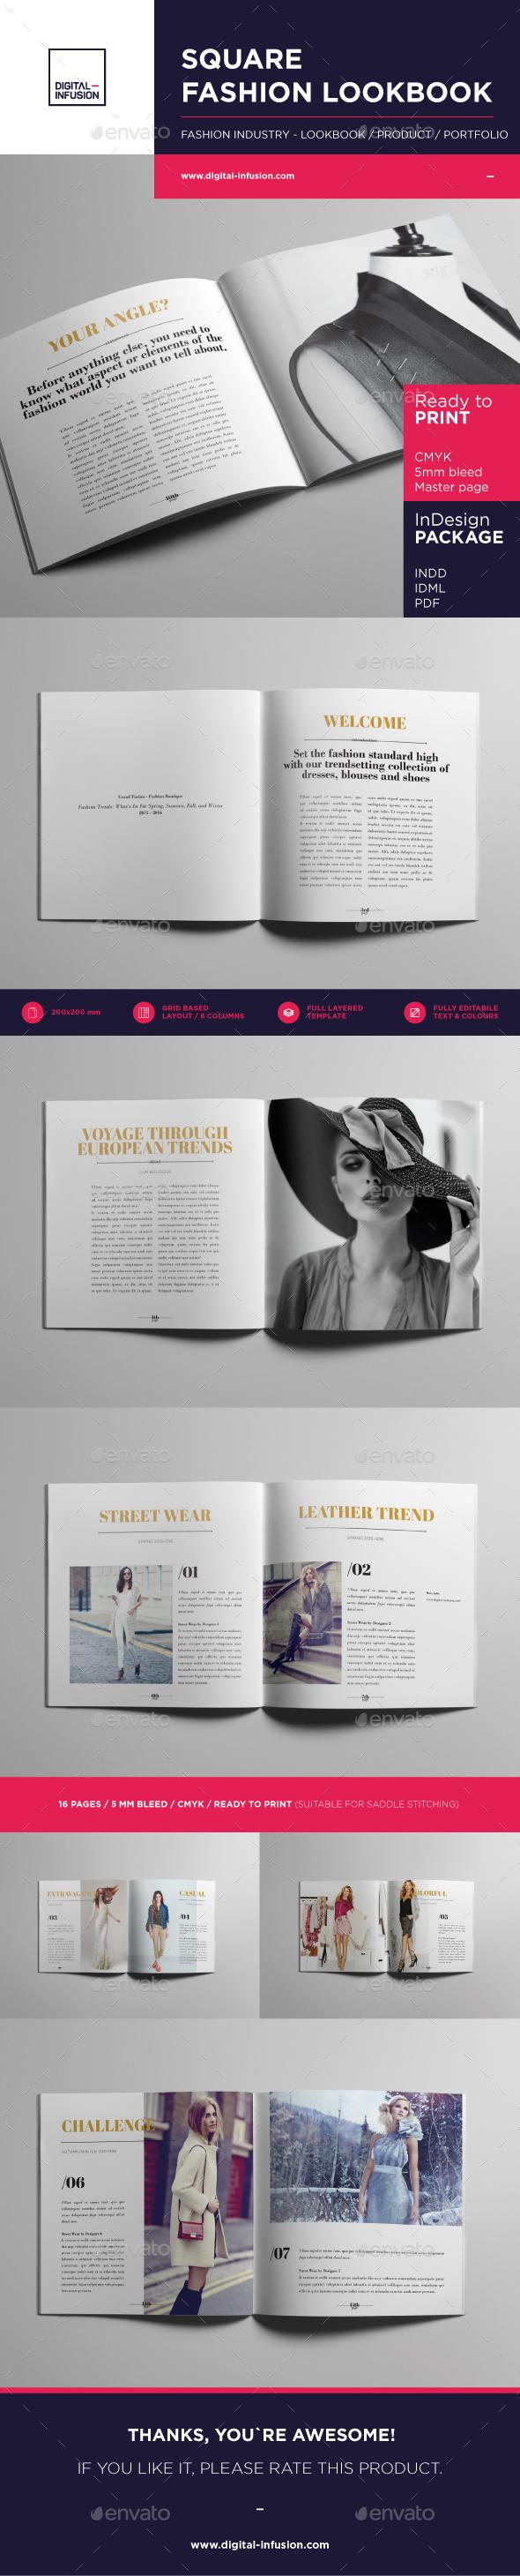 Square Fashion Lookbook / Product Book - Portfolio Brochures